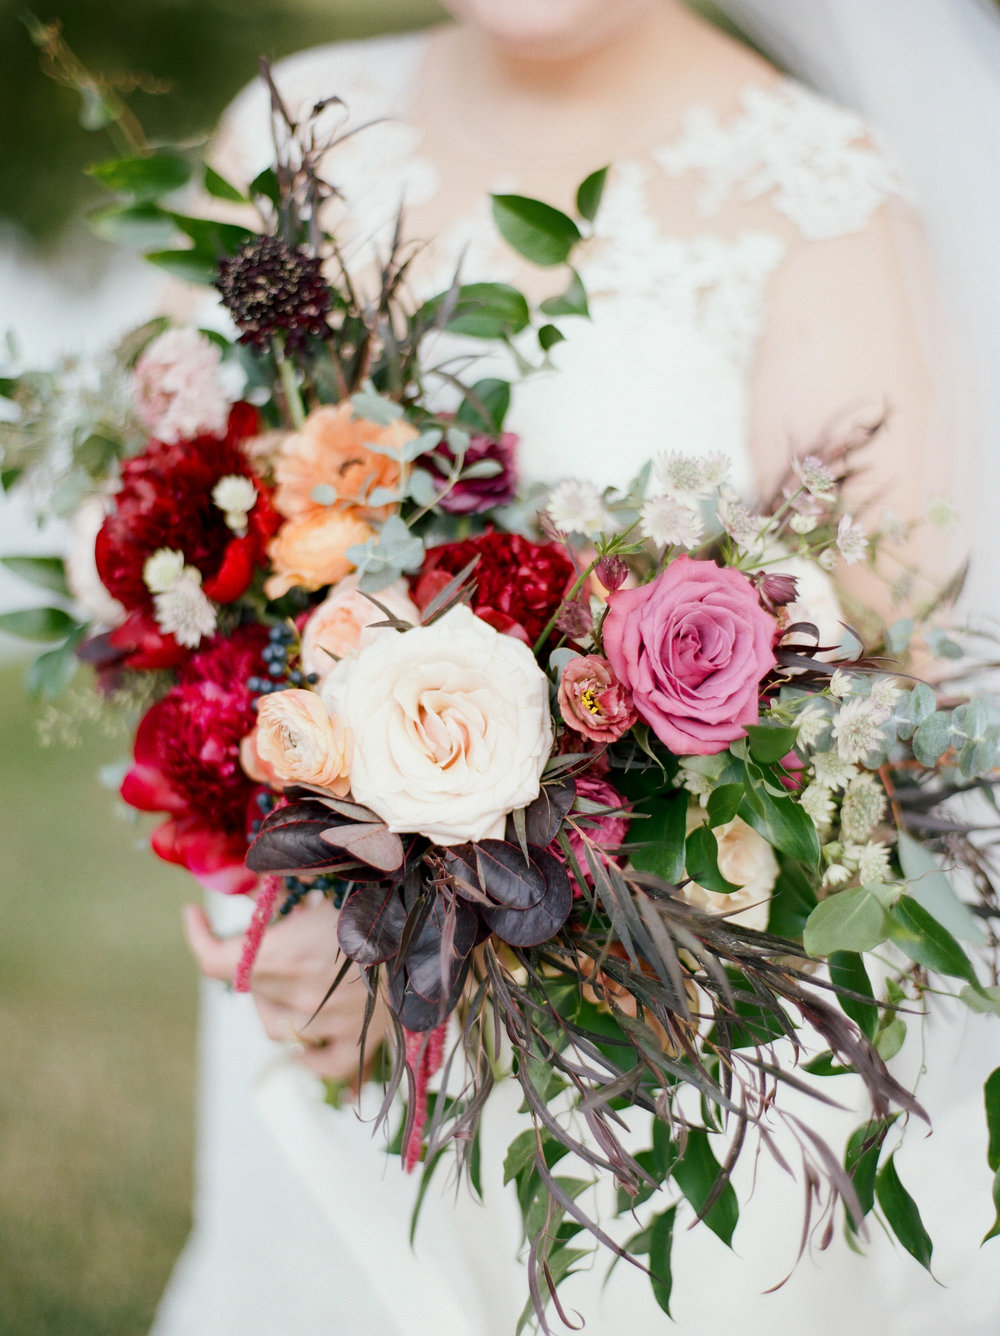 Houston-Wedding-Photographer-Fine-Art-Film-Destination-Style-Me-Pretty-Austin-Dallas-New-Orleans-Dana-Fernandez-Photography-The Woodlands-Country-Club-5.jpg